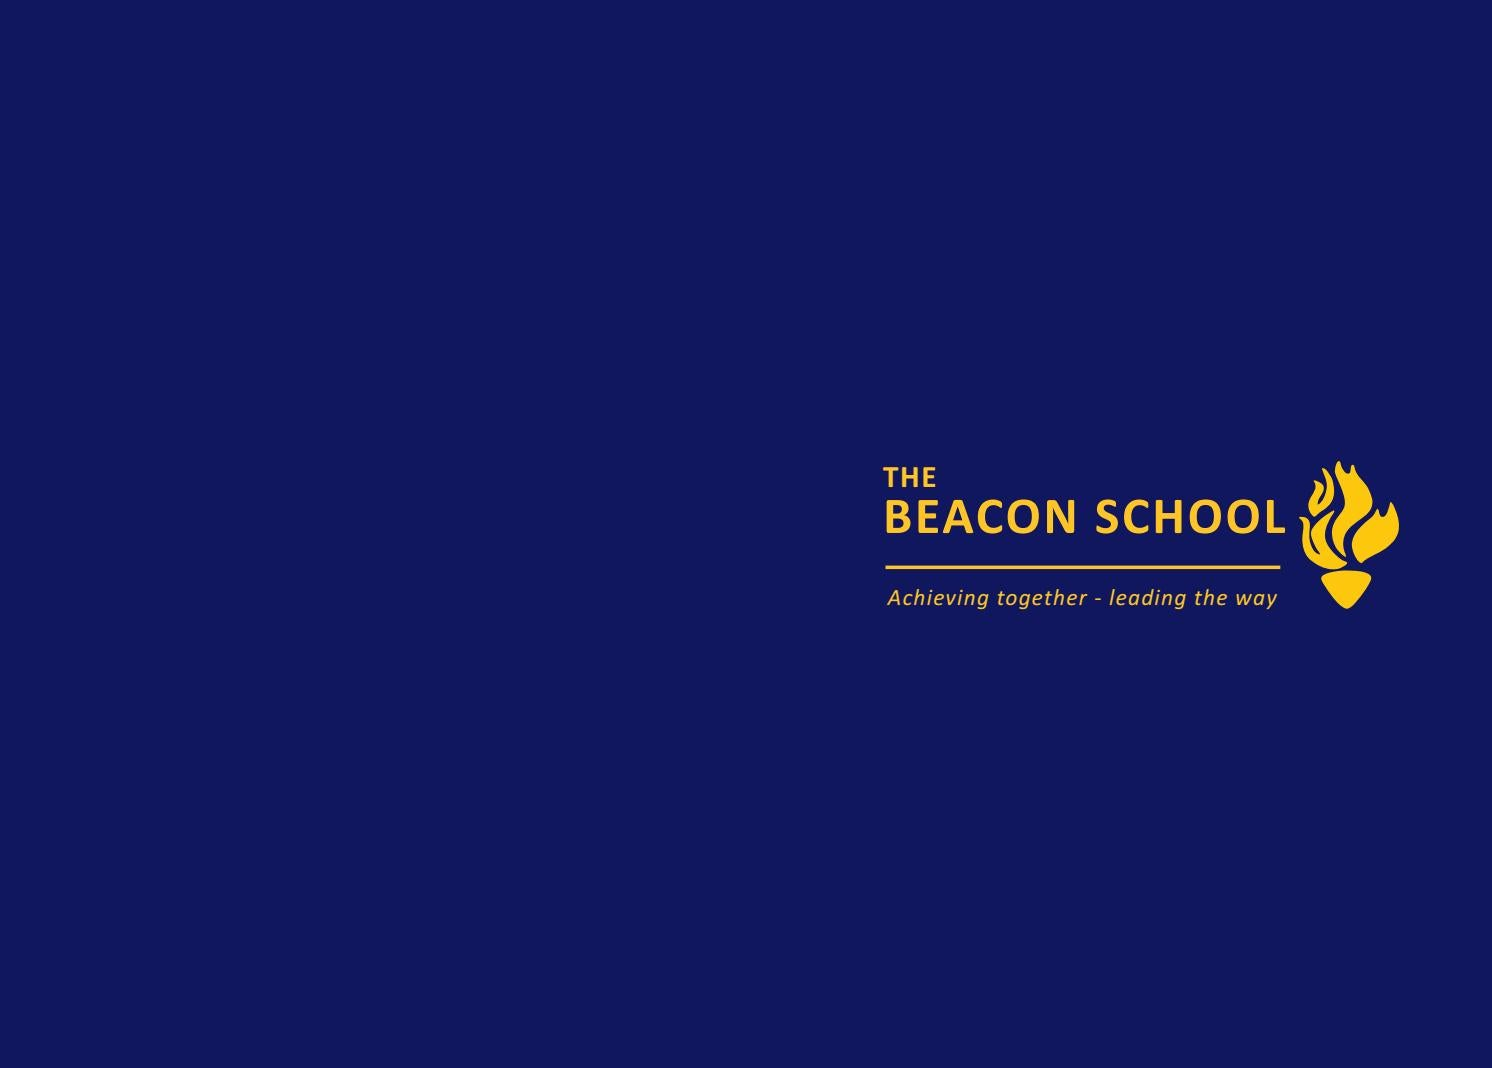 beacon school banstead show my homework